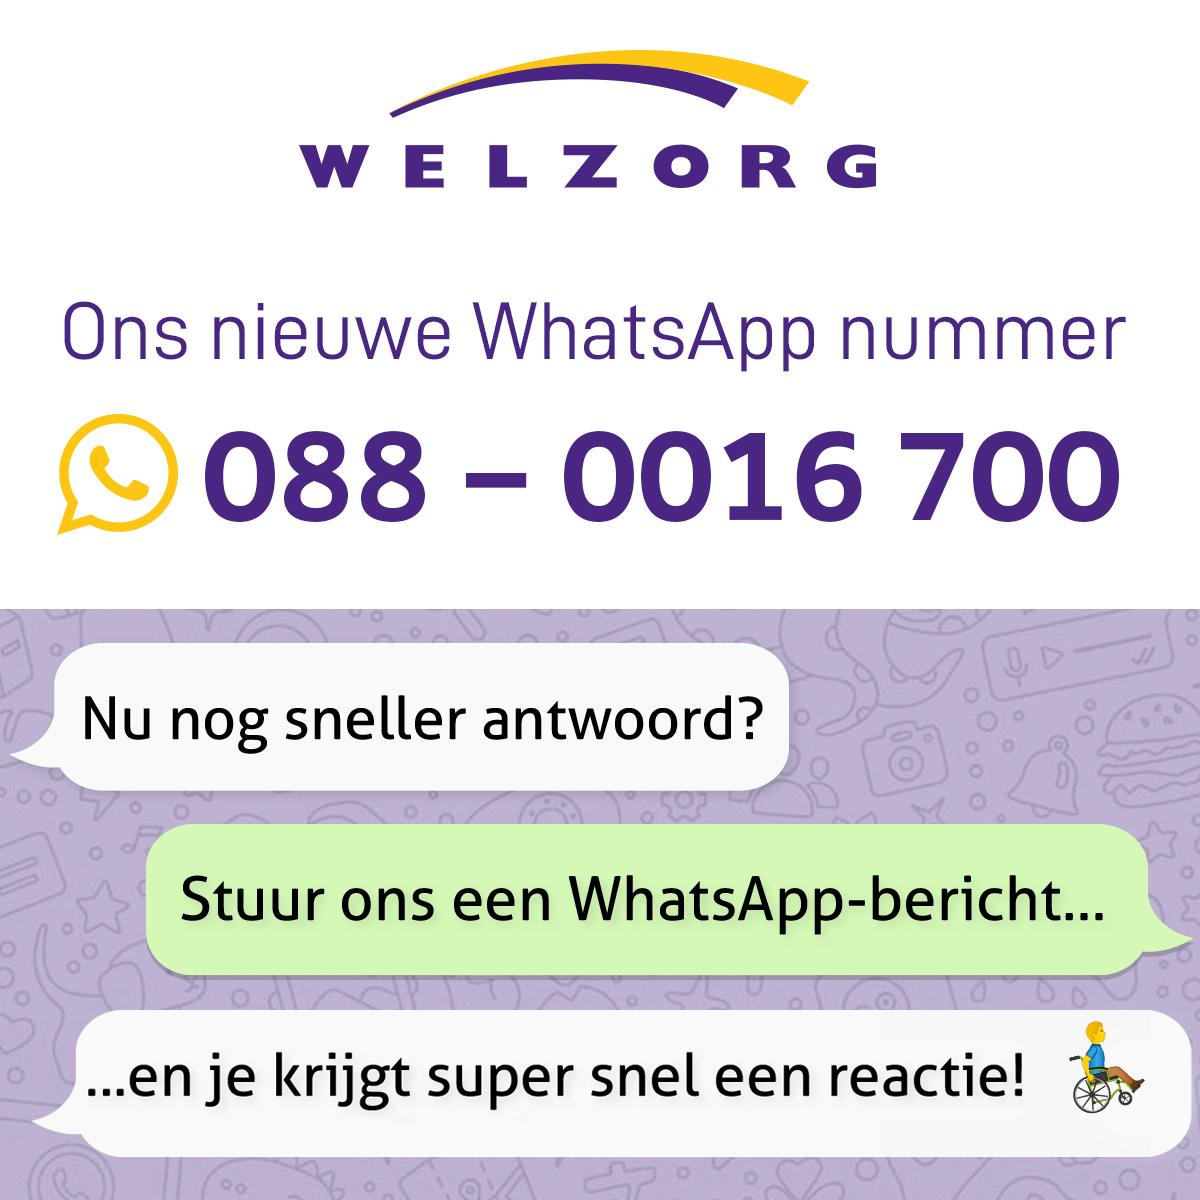 Ons nieuwe WhatsApp-nummer